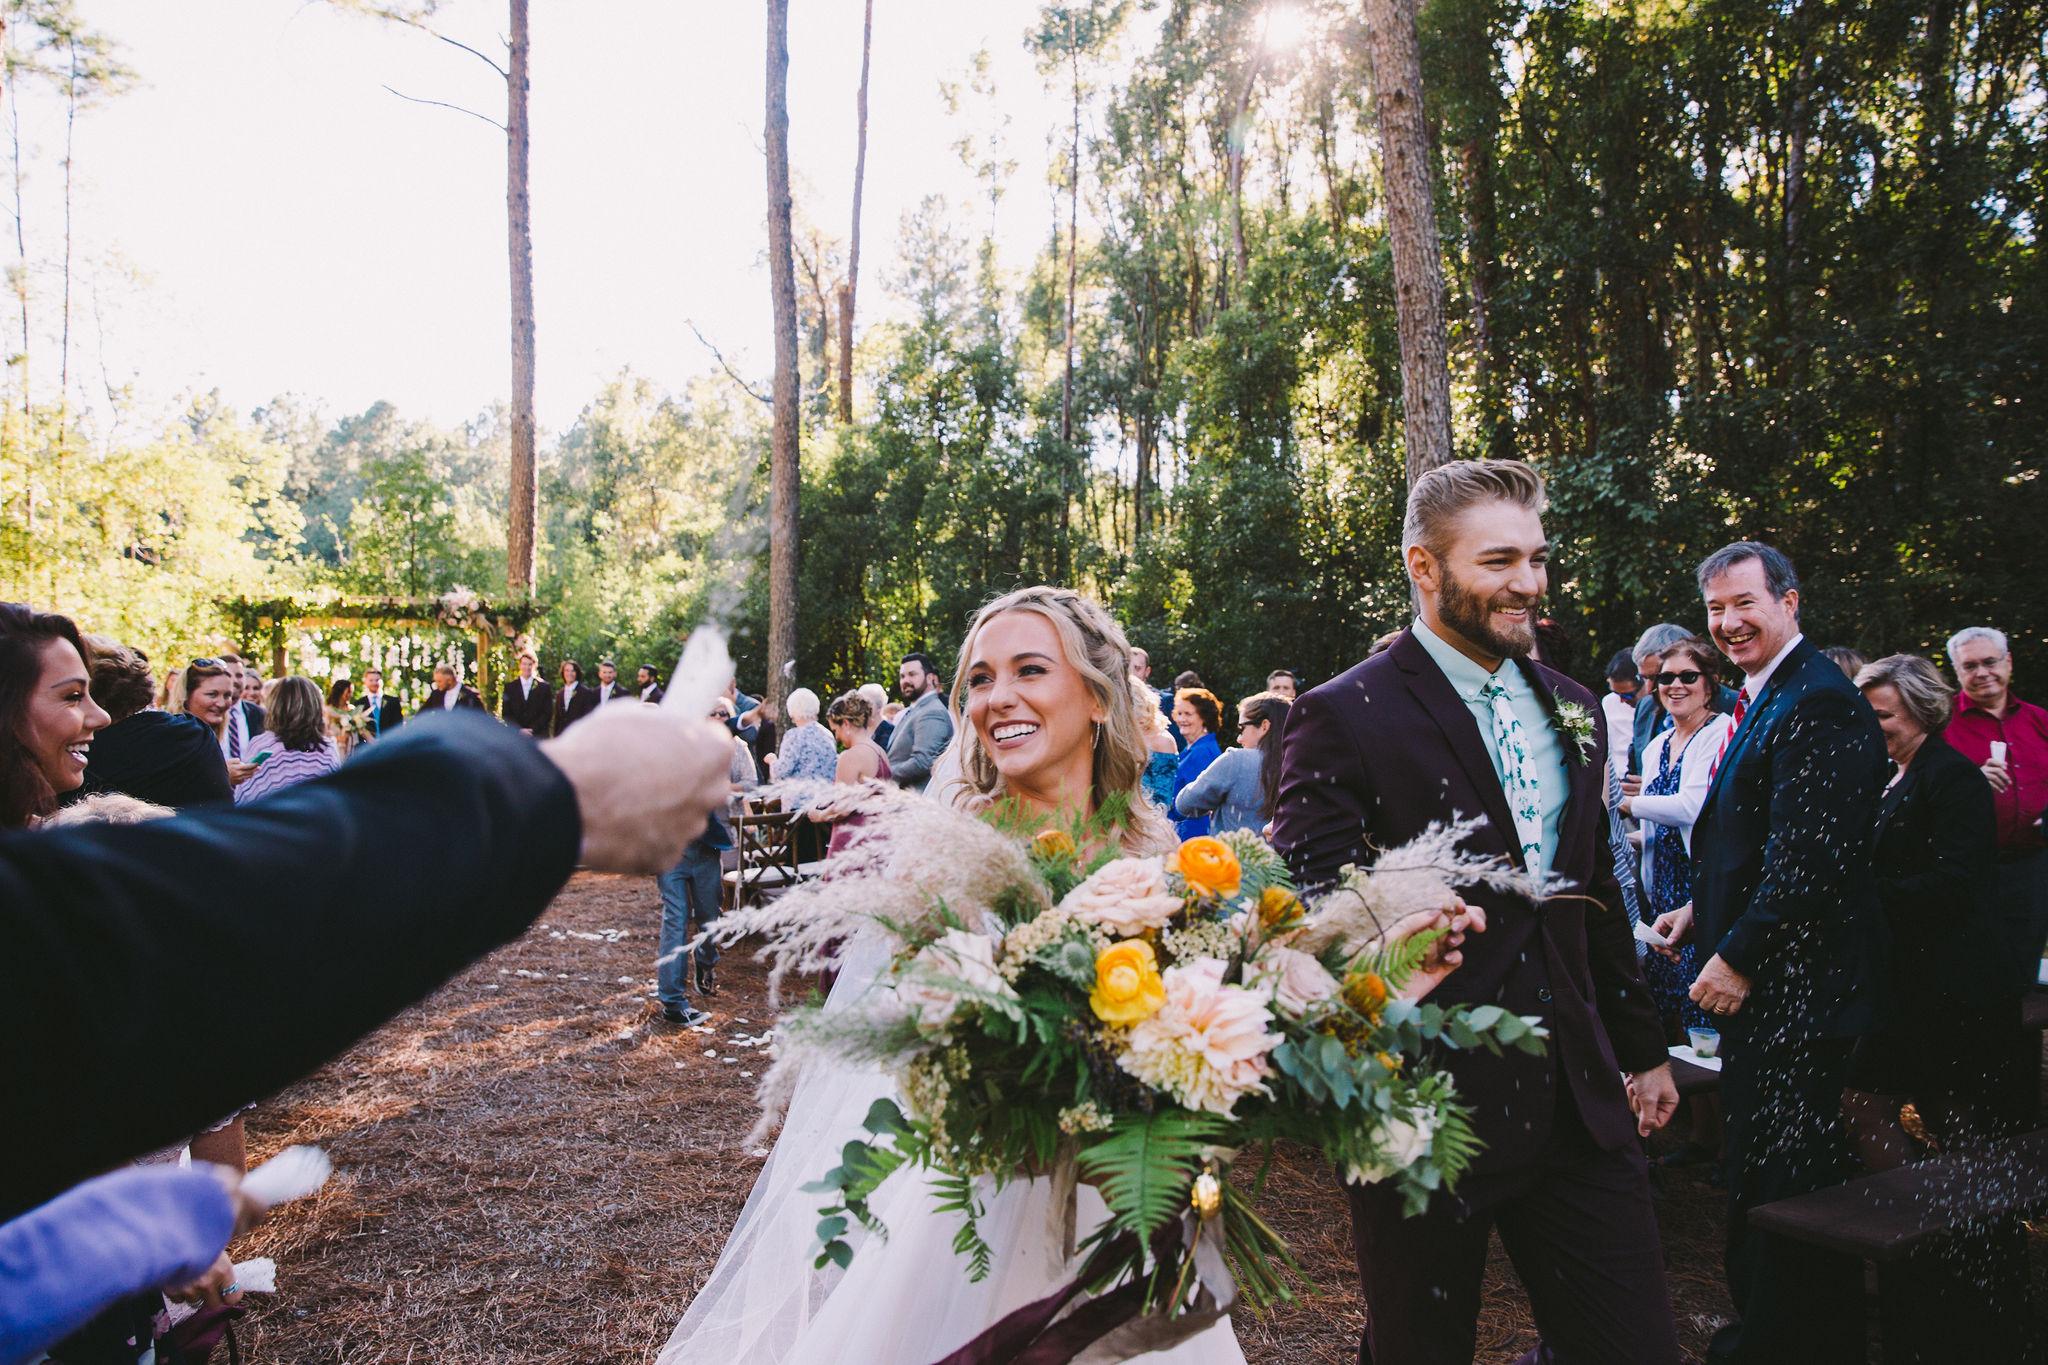 Jesseandlex_181103_AlexisNate_Wedding_Ceremony_171.jpg